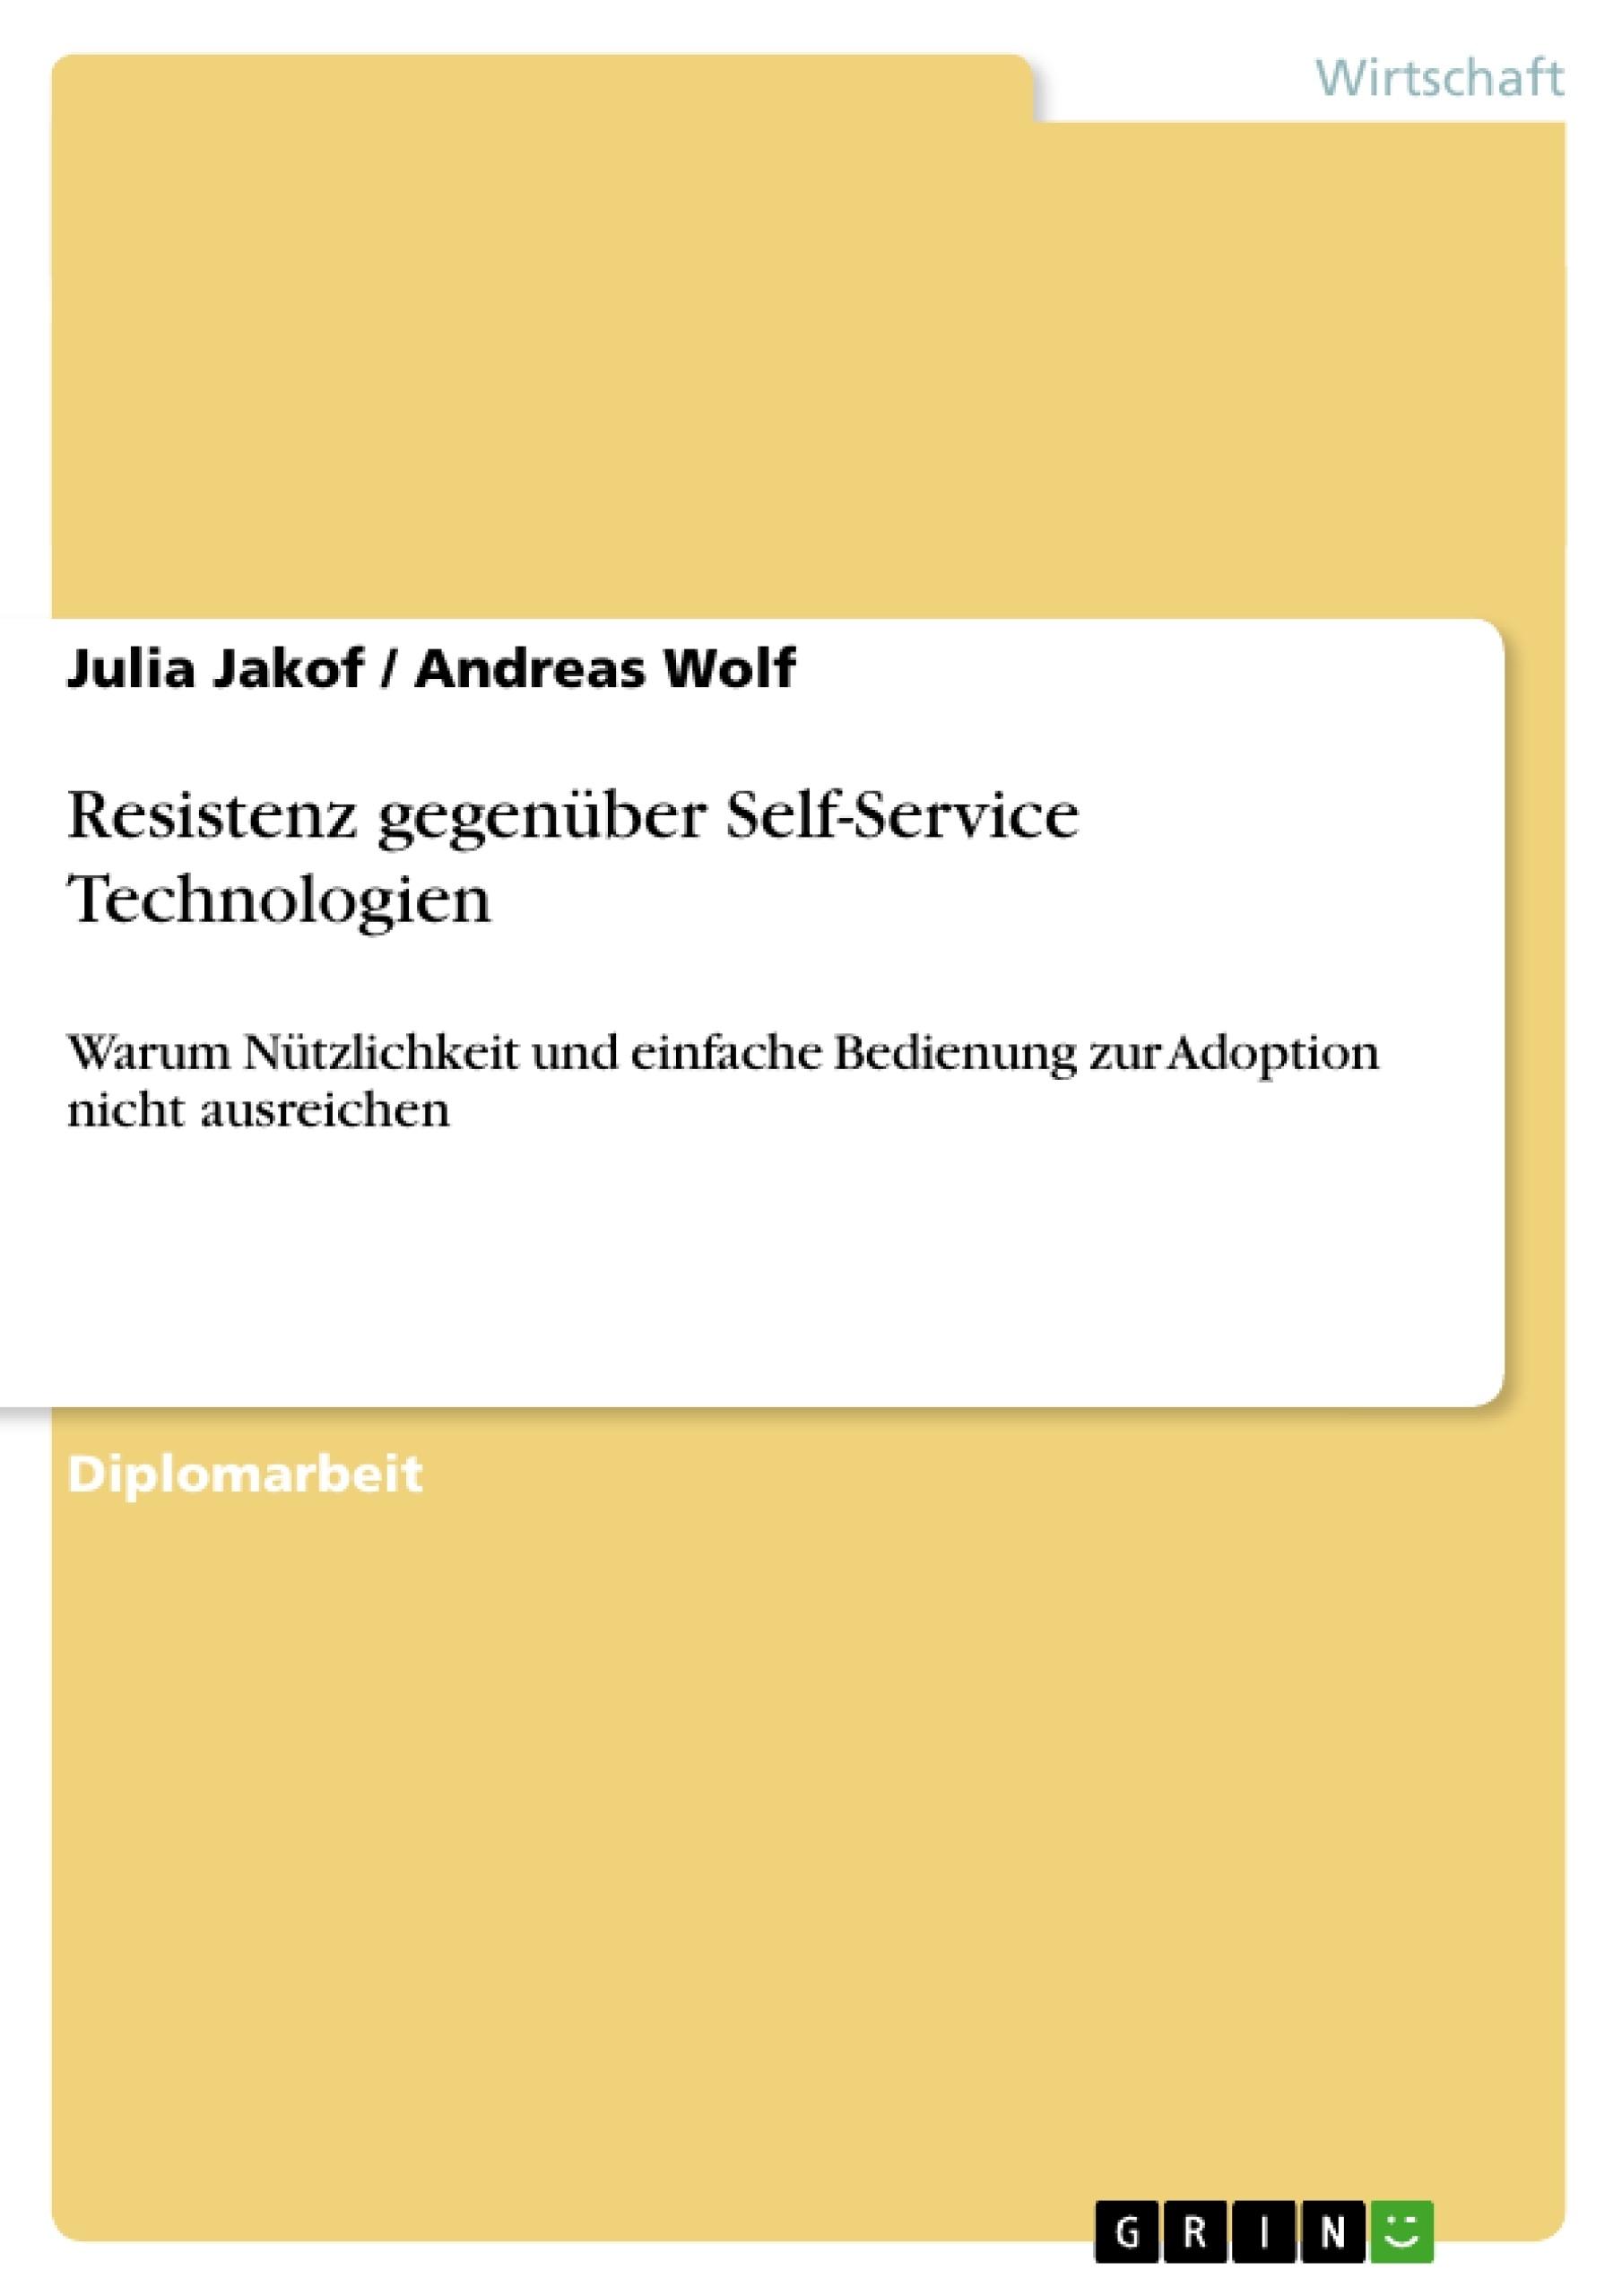 Titel: Resistenz gegenüber Self-Service Technologien